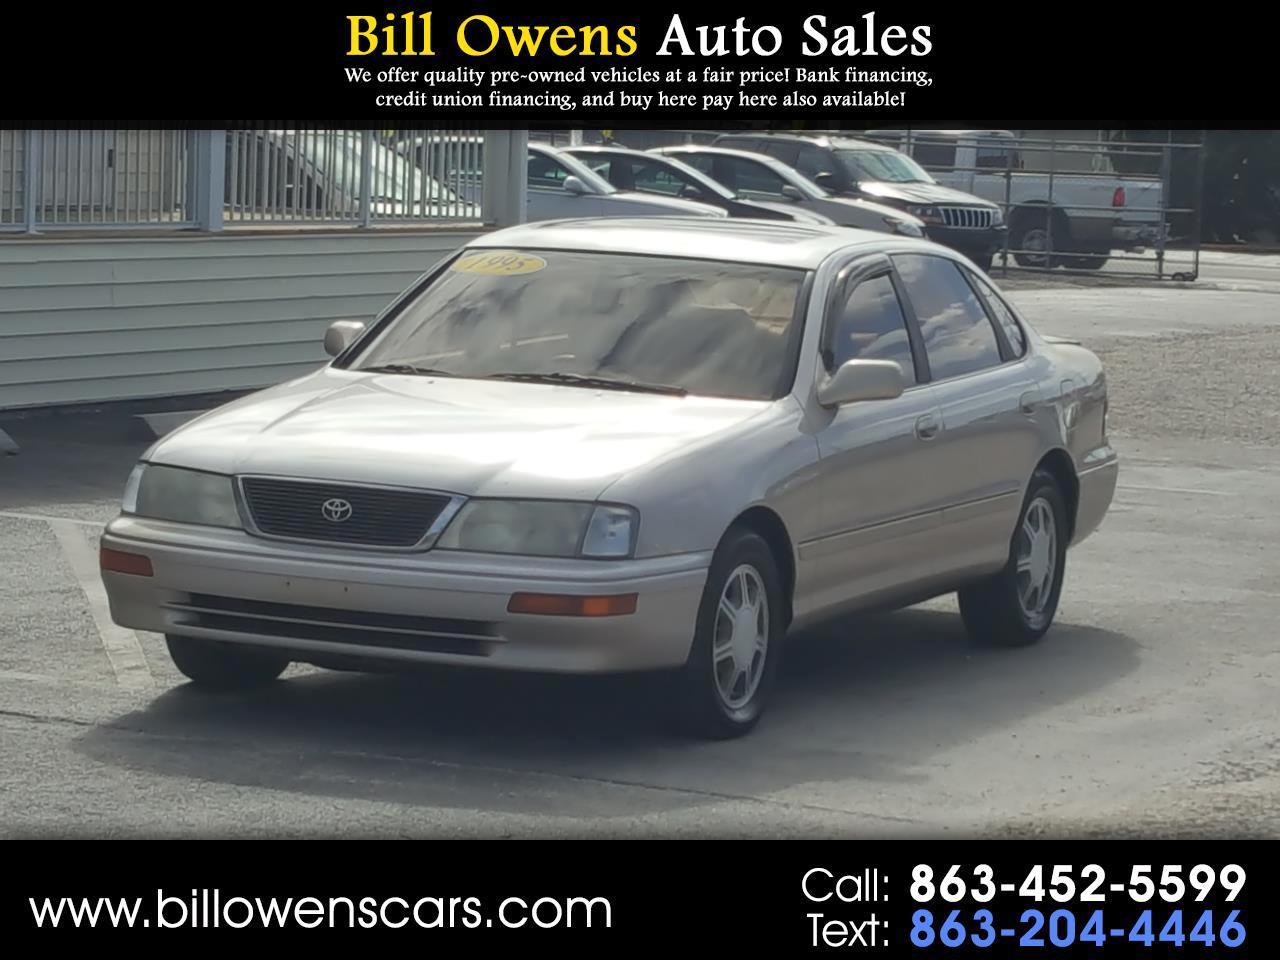 Toyota Avalon 4dr Sedan XLS w/Bench Seat 1995